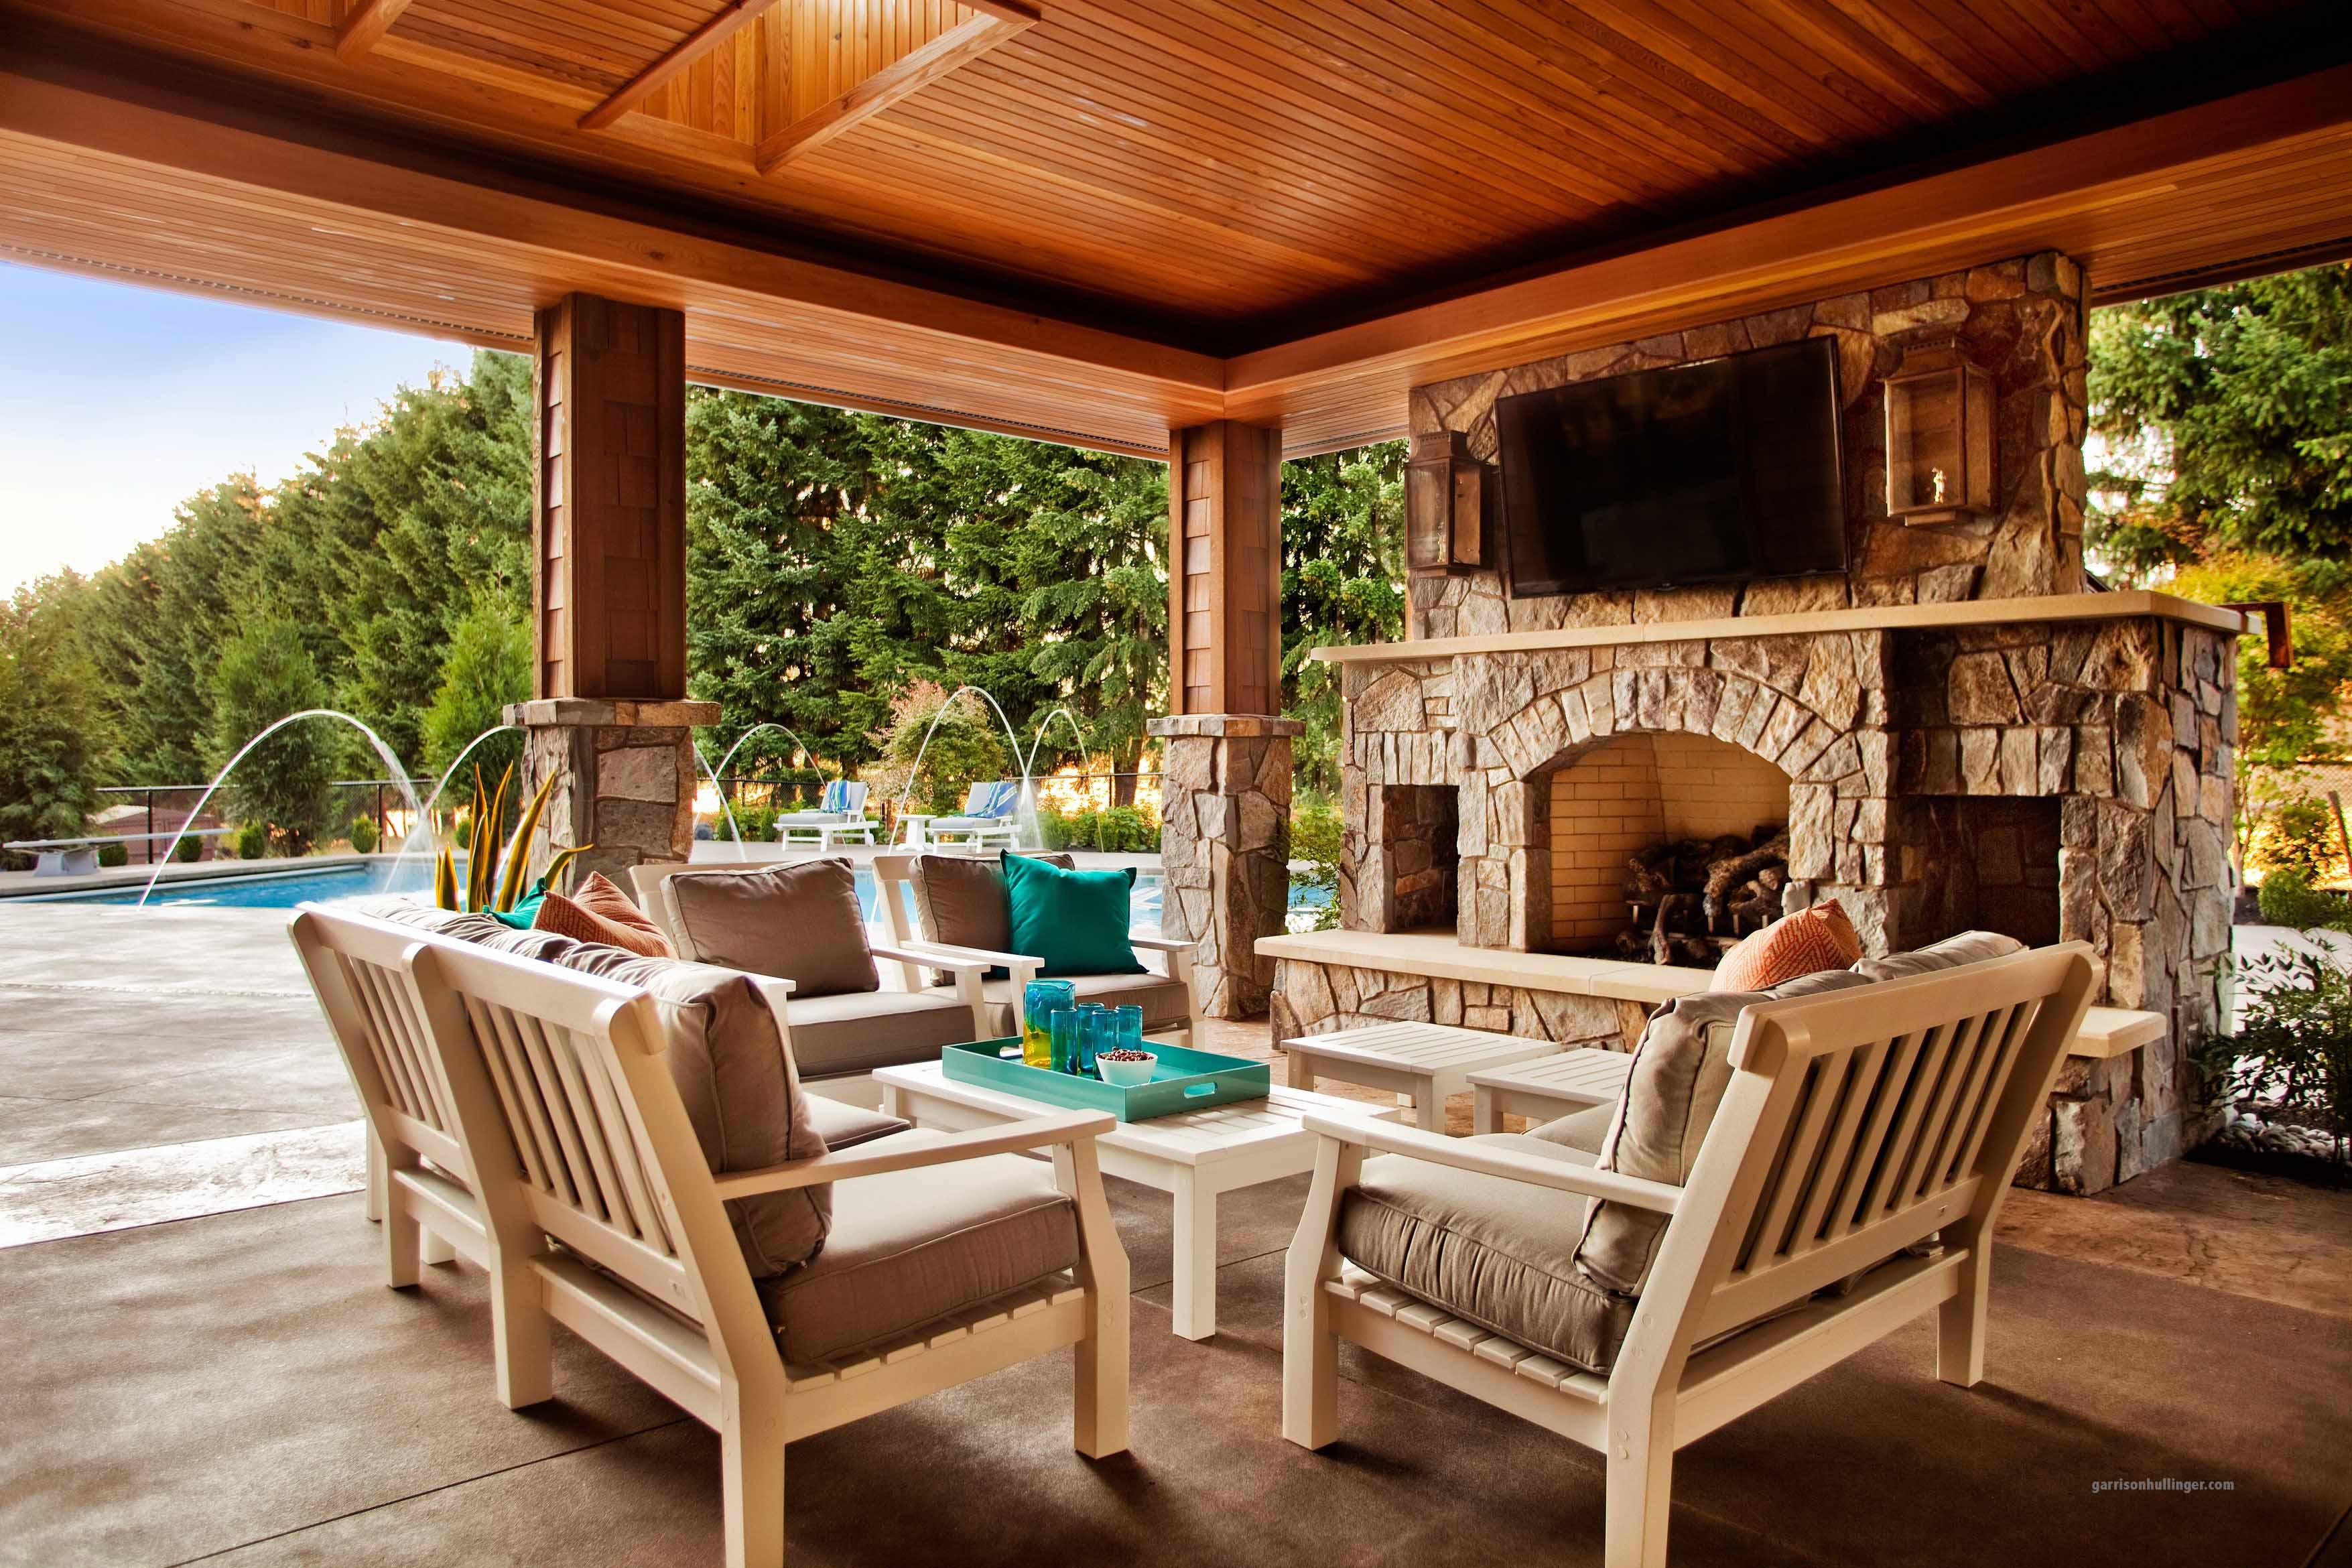 15 Incredible Rustic Outdoor Design Ideas